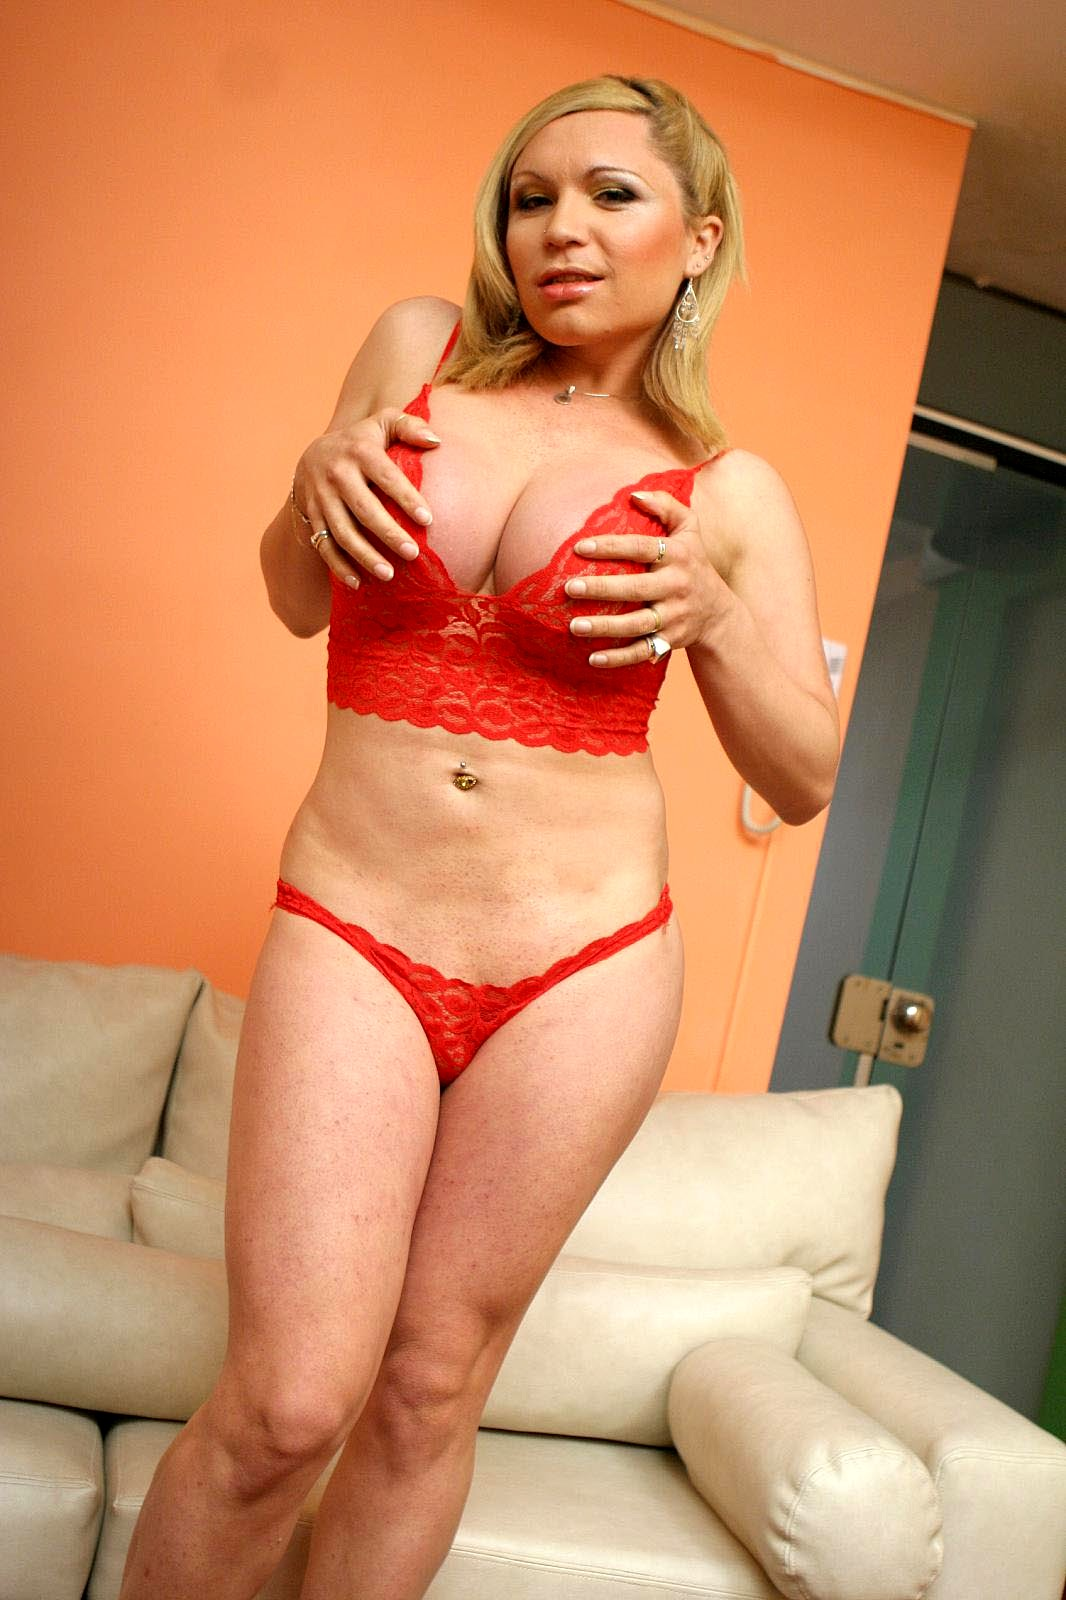 Curvy Femboy Karen Visconti Getting Her Transexual Tool Tease